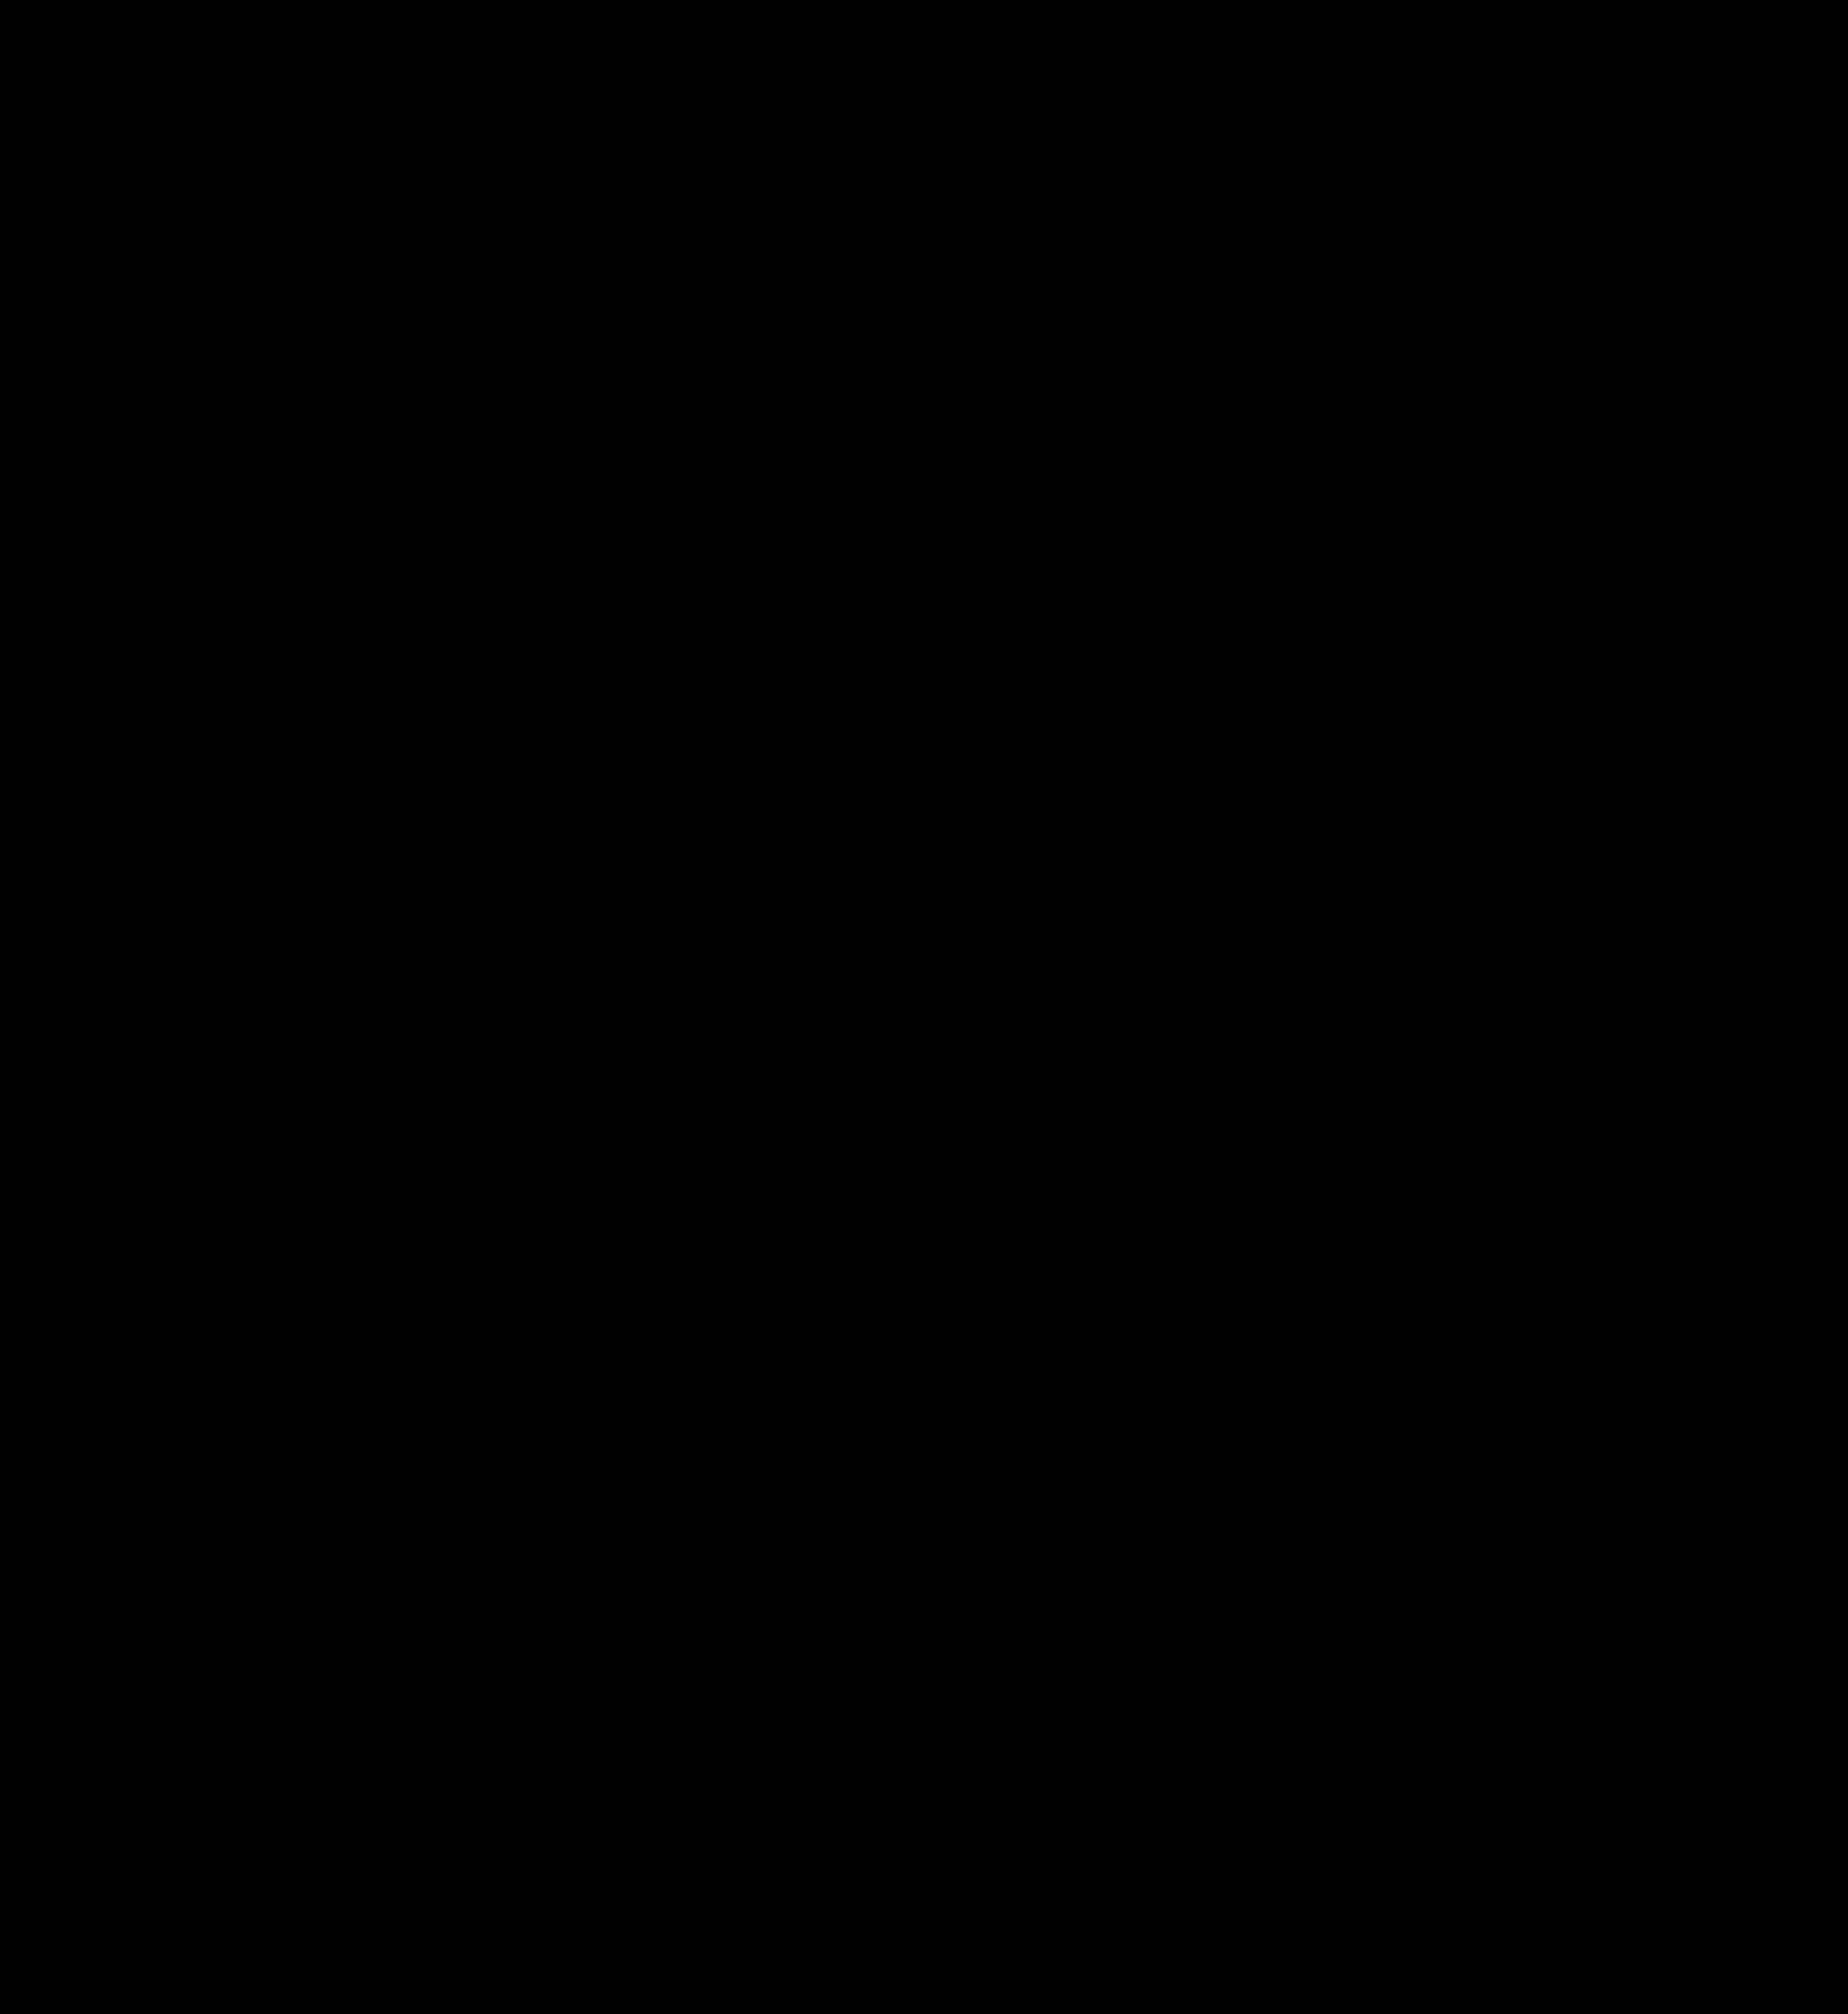 Phonegap Logo Png Transparent Svg Vector Freebie Supply